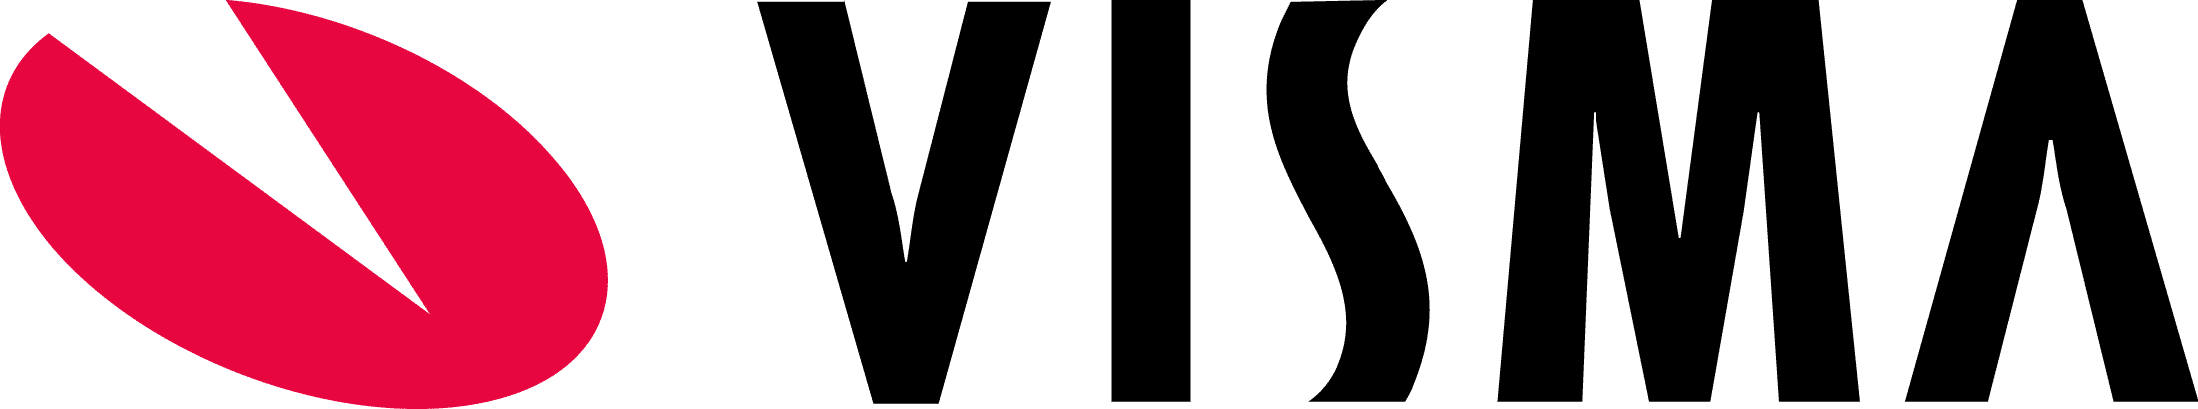 visma logo skybasert